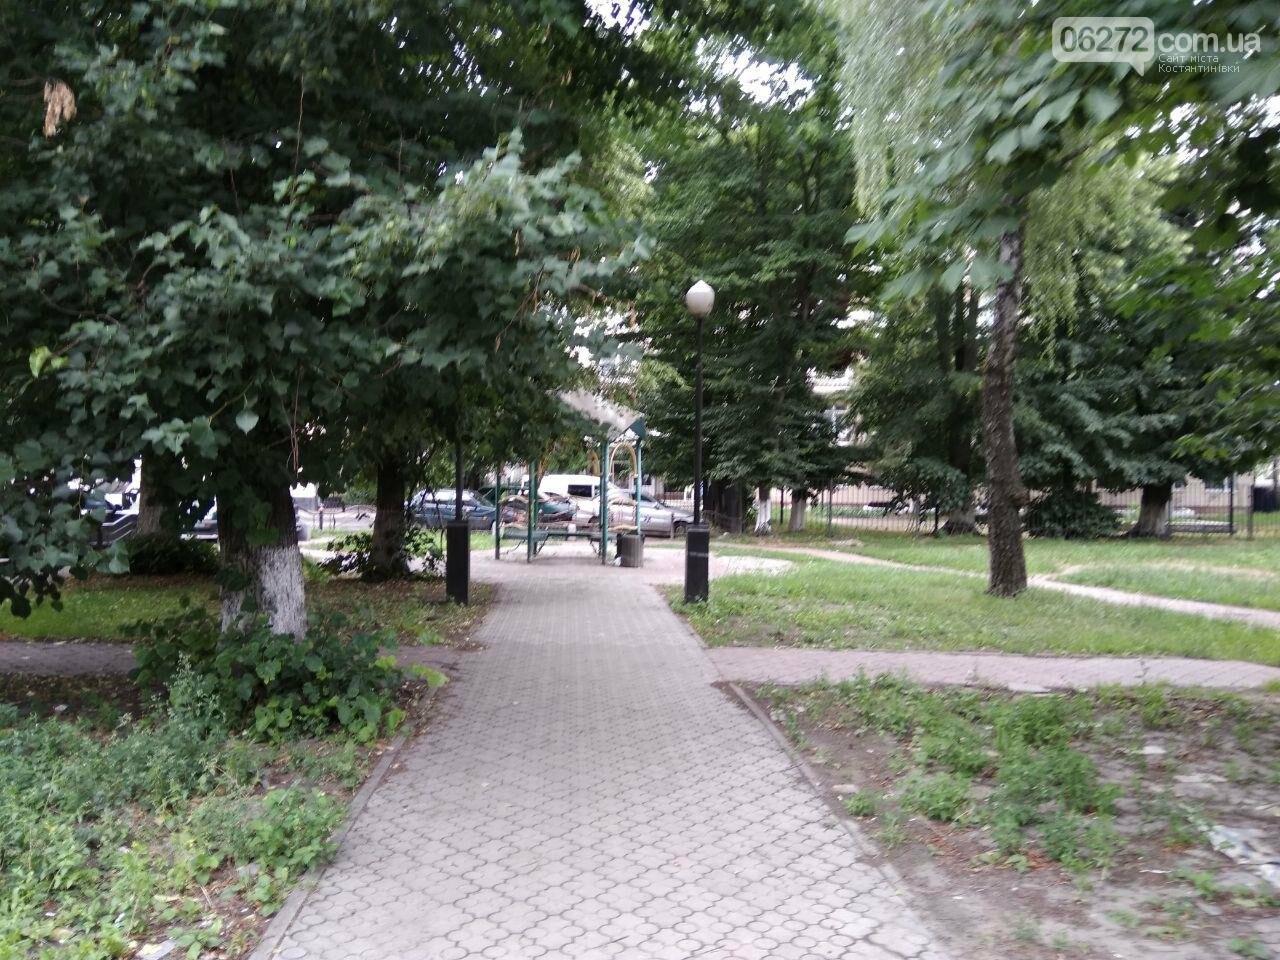 Автостопом по Украине: все пошло не по плану, фото-22